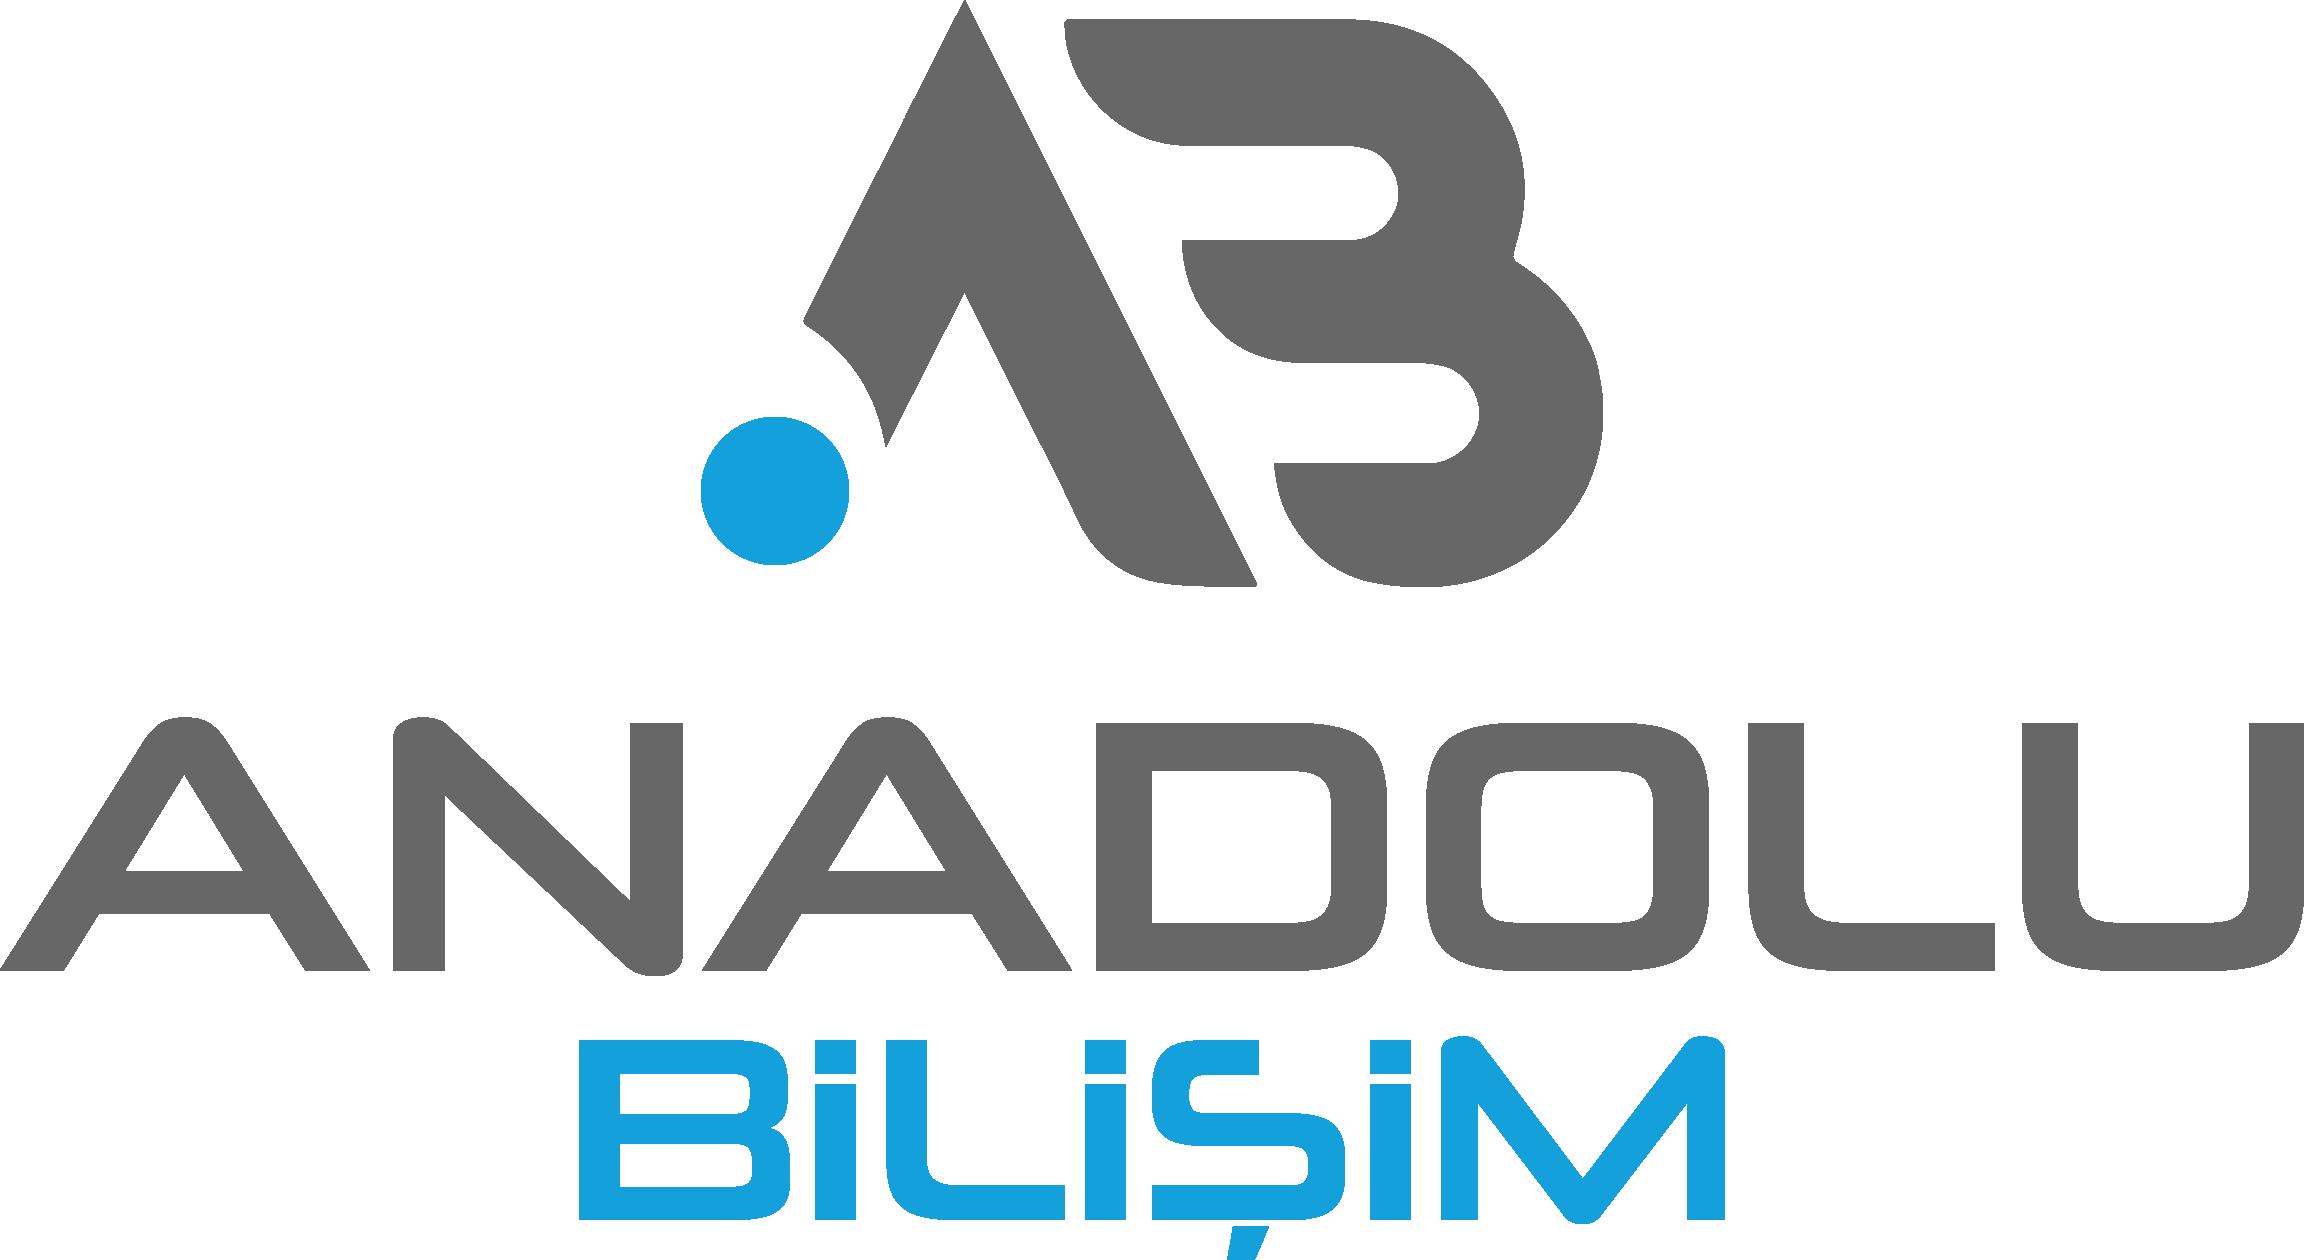 Anadolu Bilisim